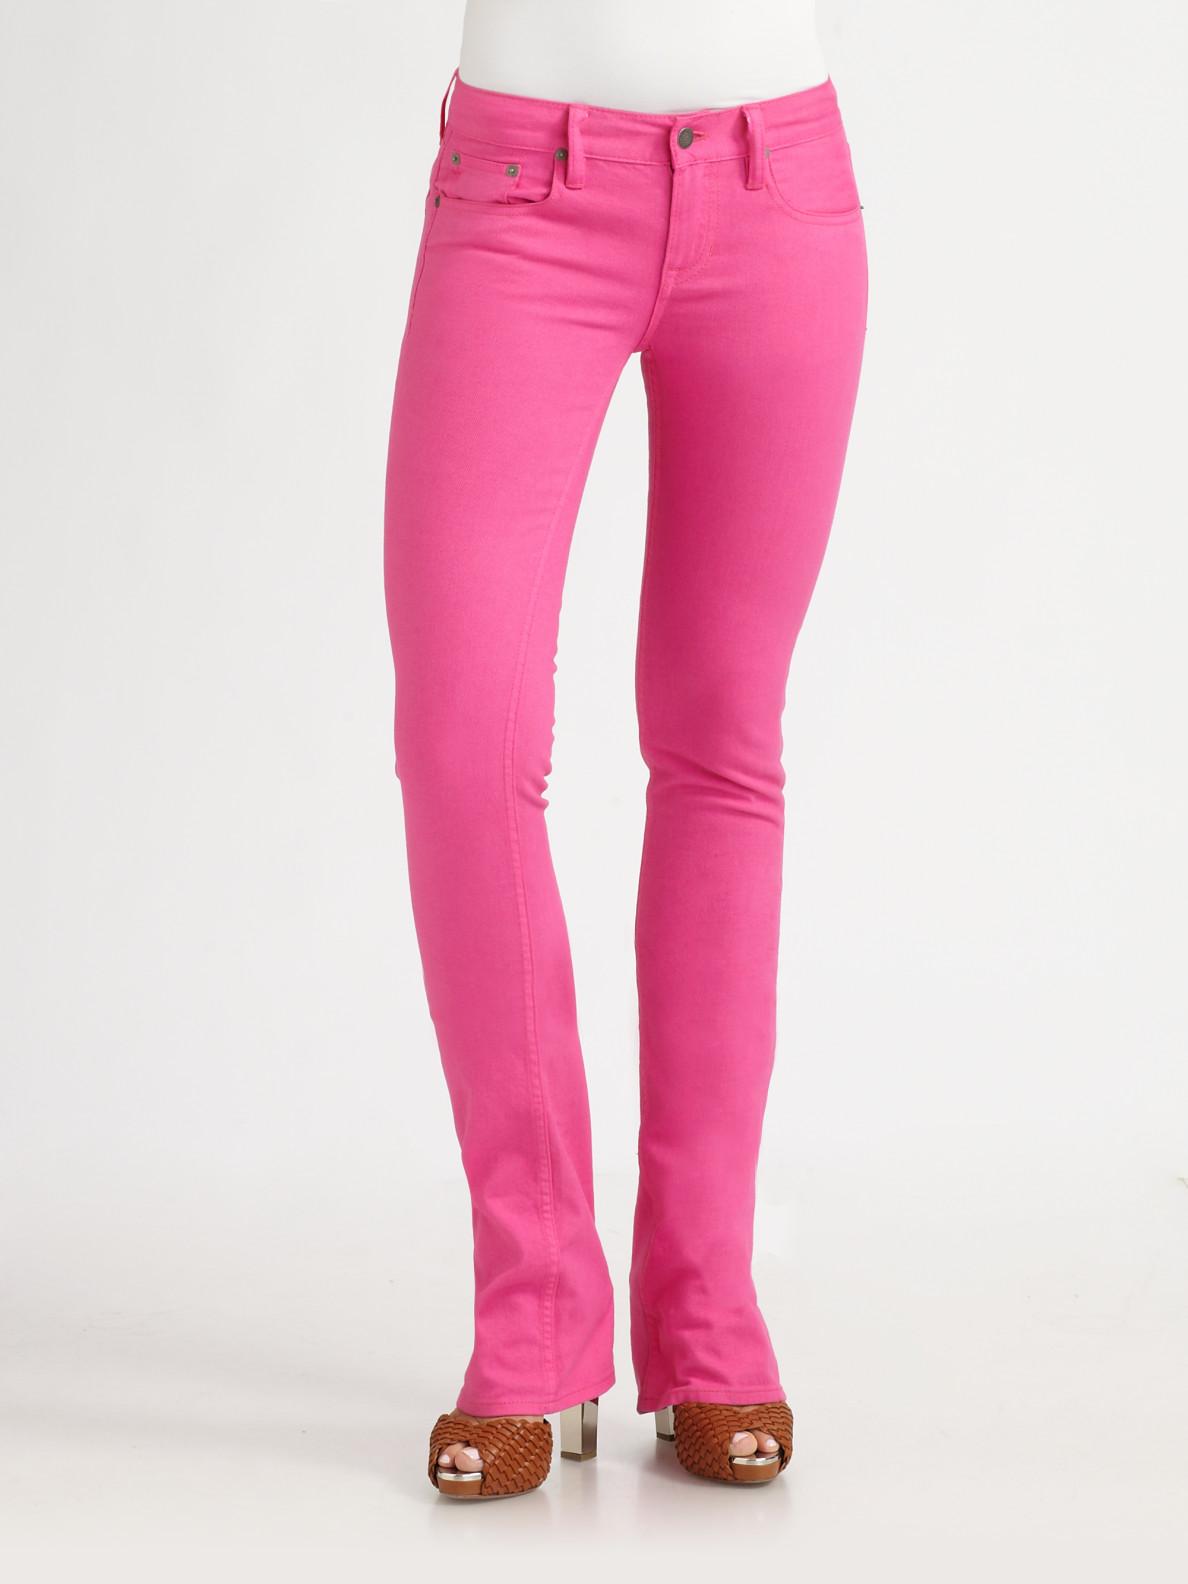 Lyst Ralph Lauren Blue Label Stretch Slim Bootcut Jeans